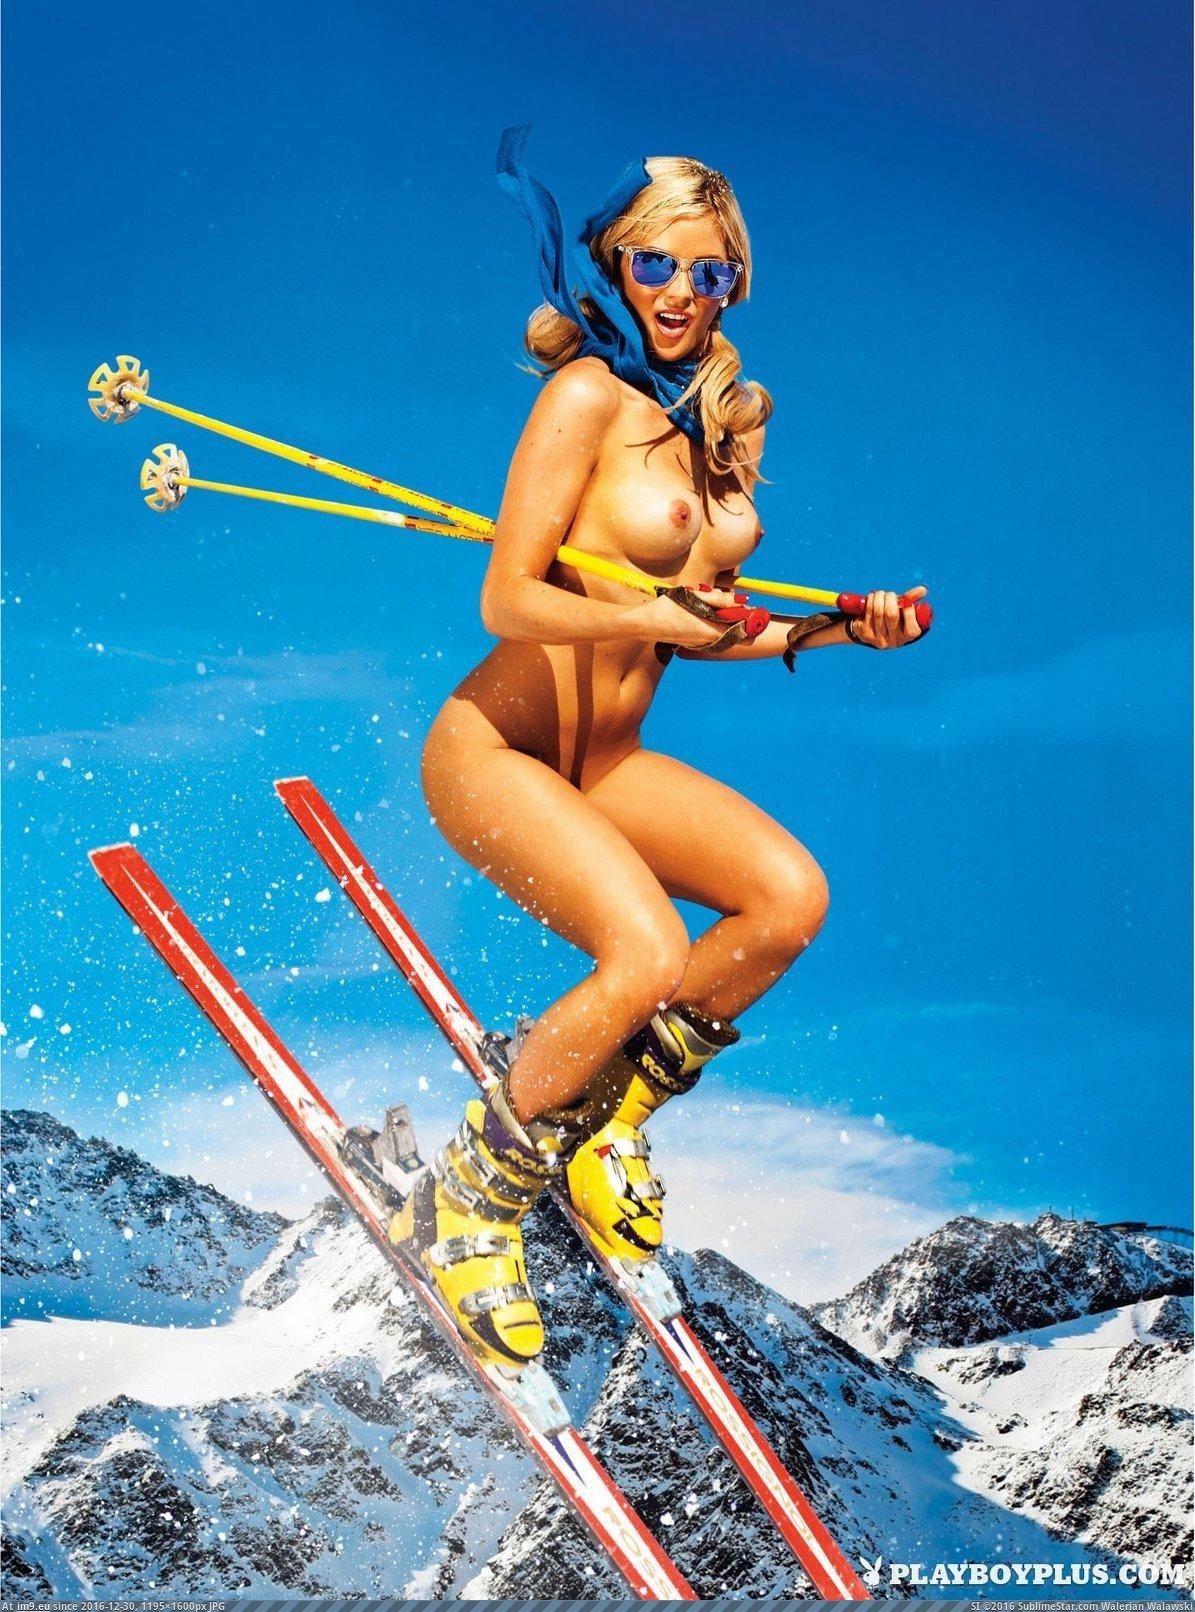 Debby skiing naked porno gratis